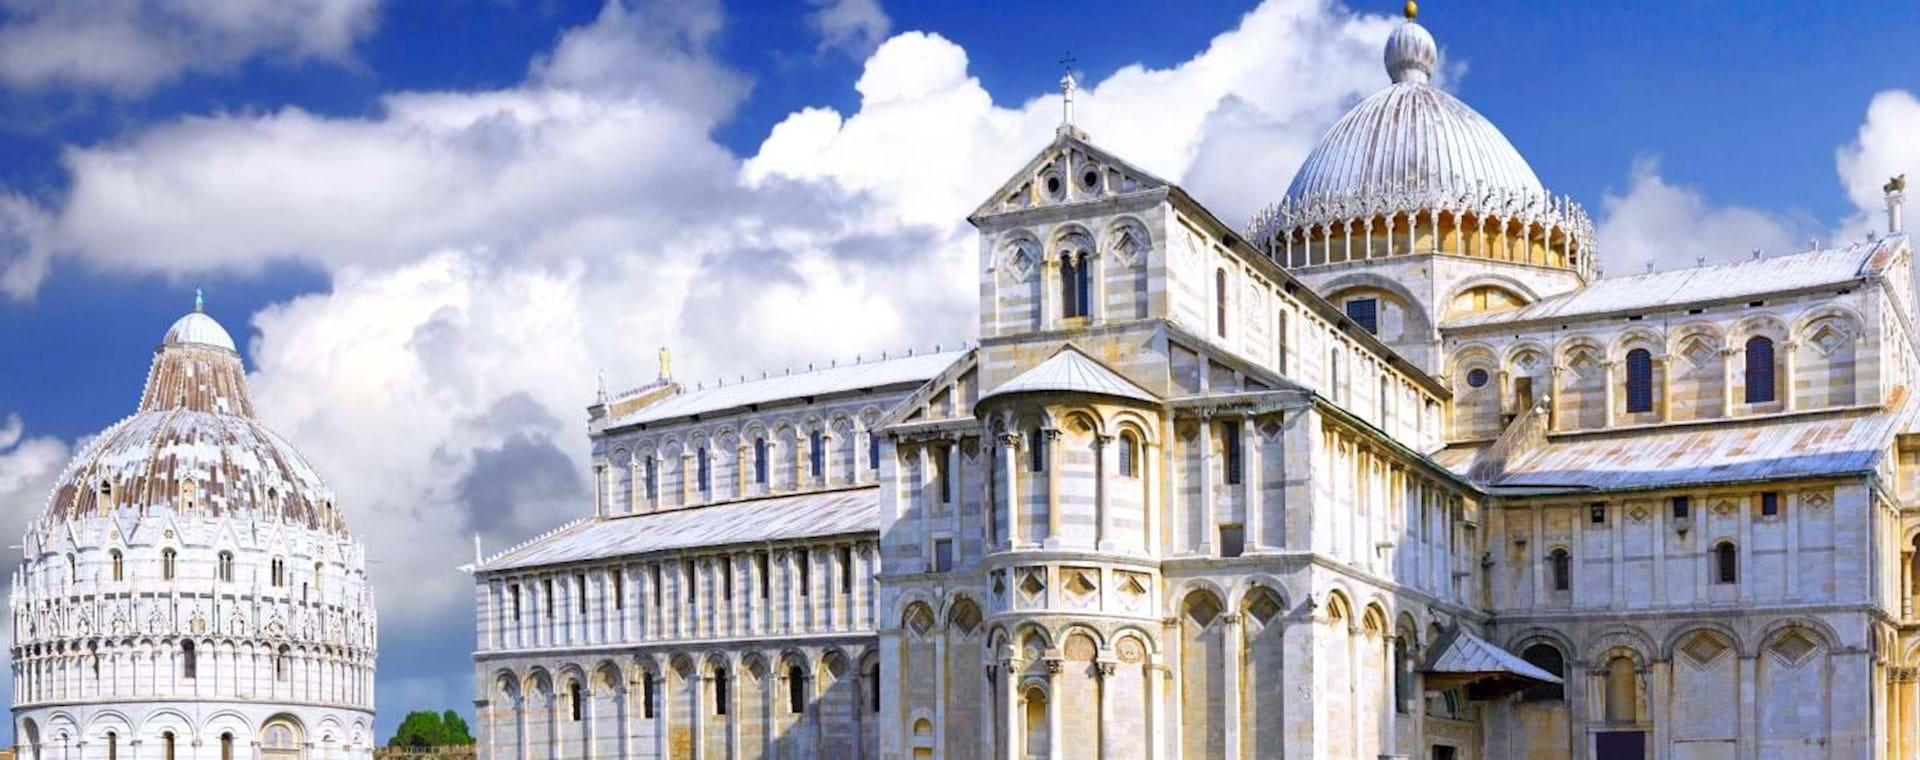 Day Trip: Pisa, San Gimignano & Siena with Skip-the-Line to Pisa Duomo